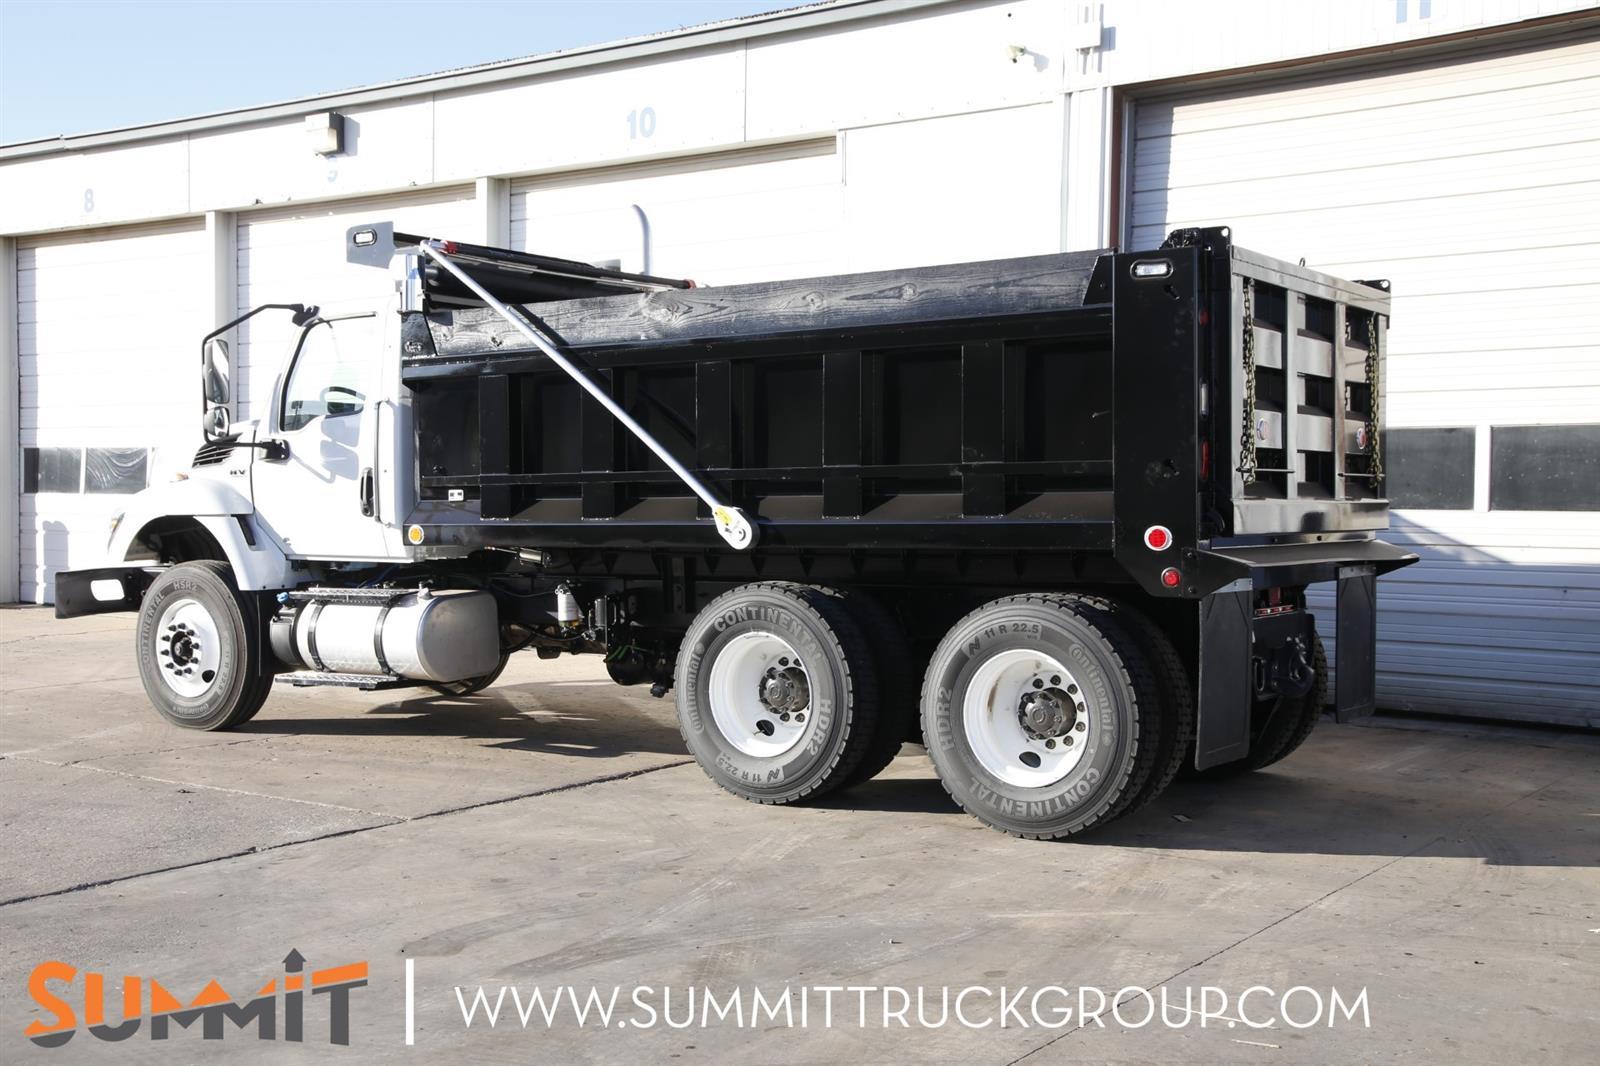 2020 International HV Regular Cab 6x4, Dump Body #LL867984 - photo 1